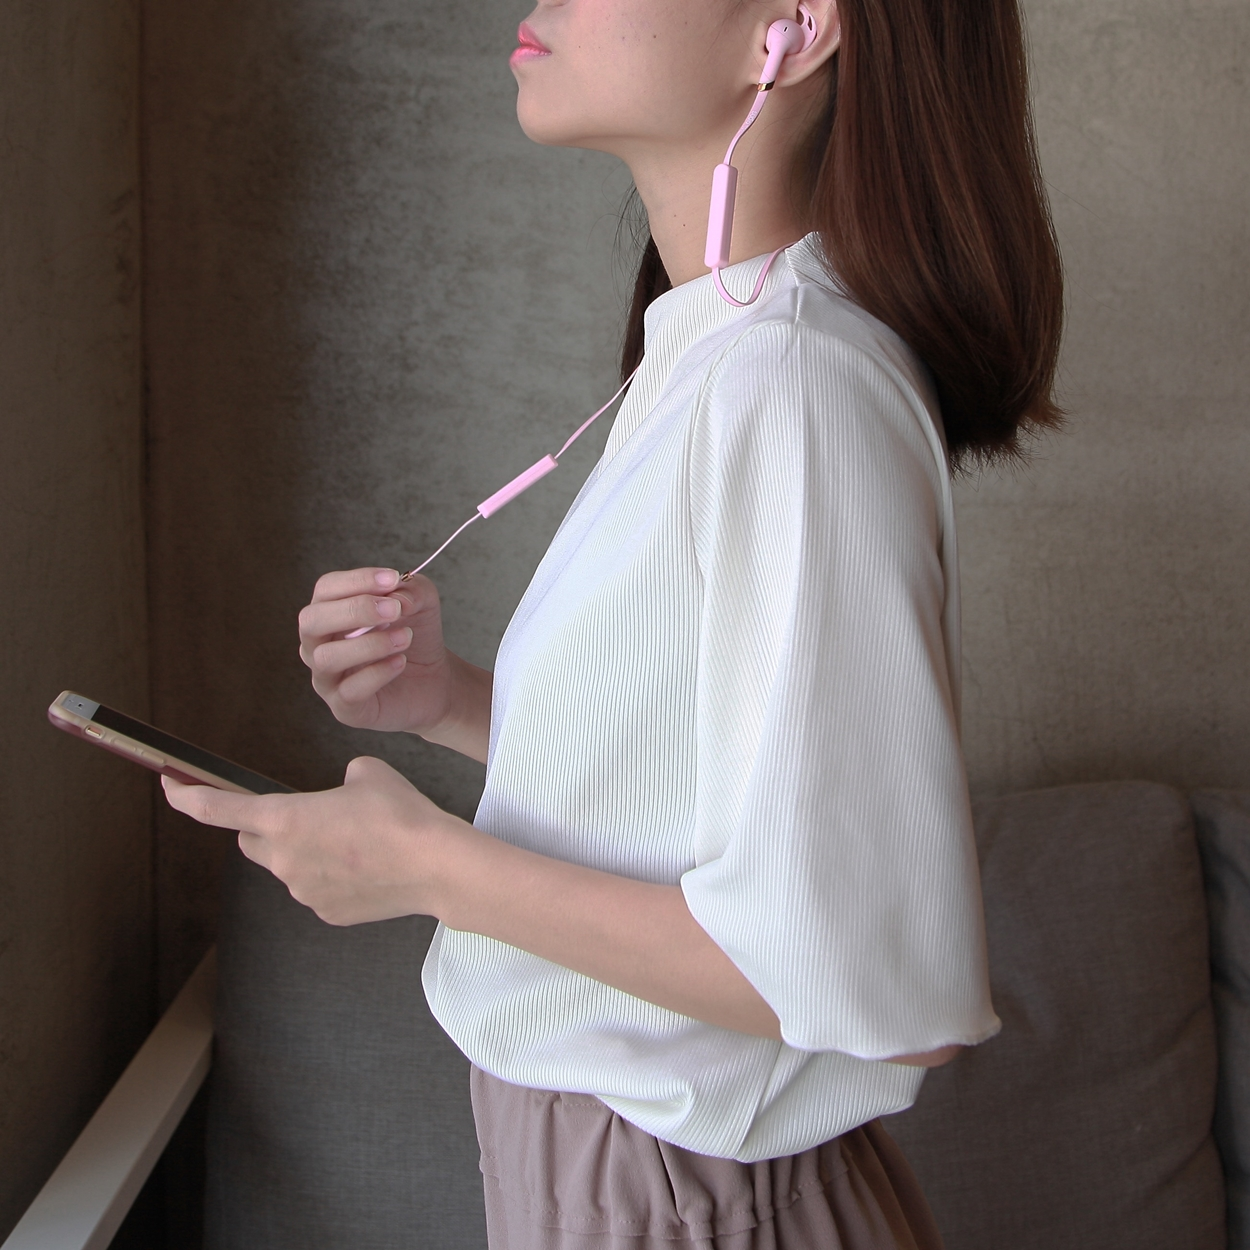 SUDIO TRE 藍芽耳機 by Aimee Tale Valise